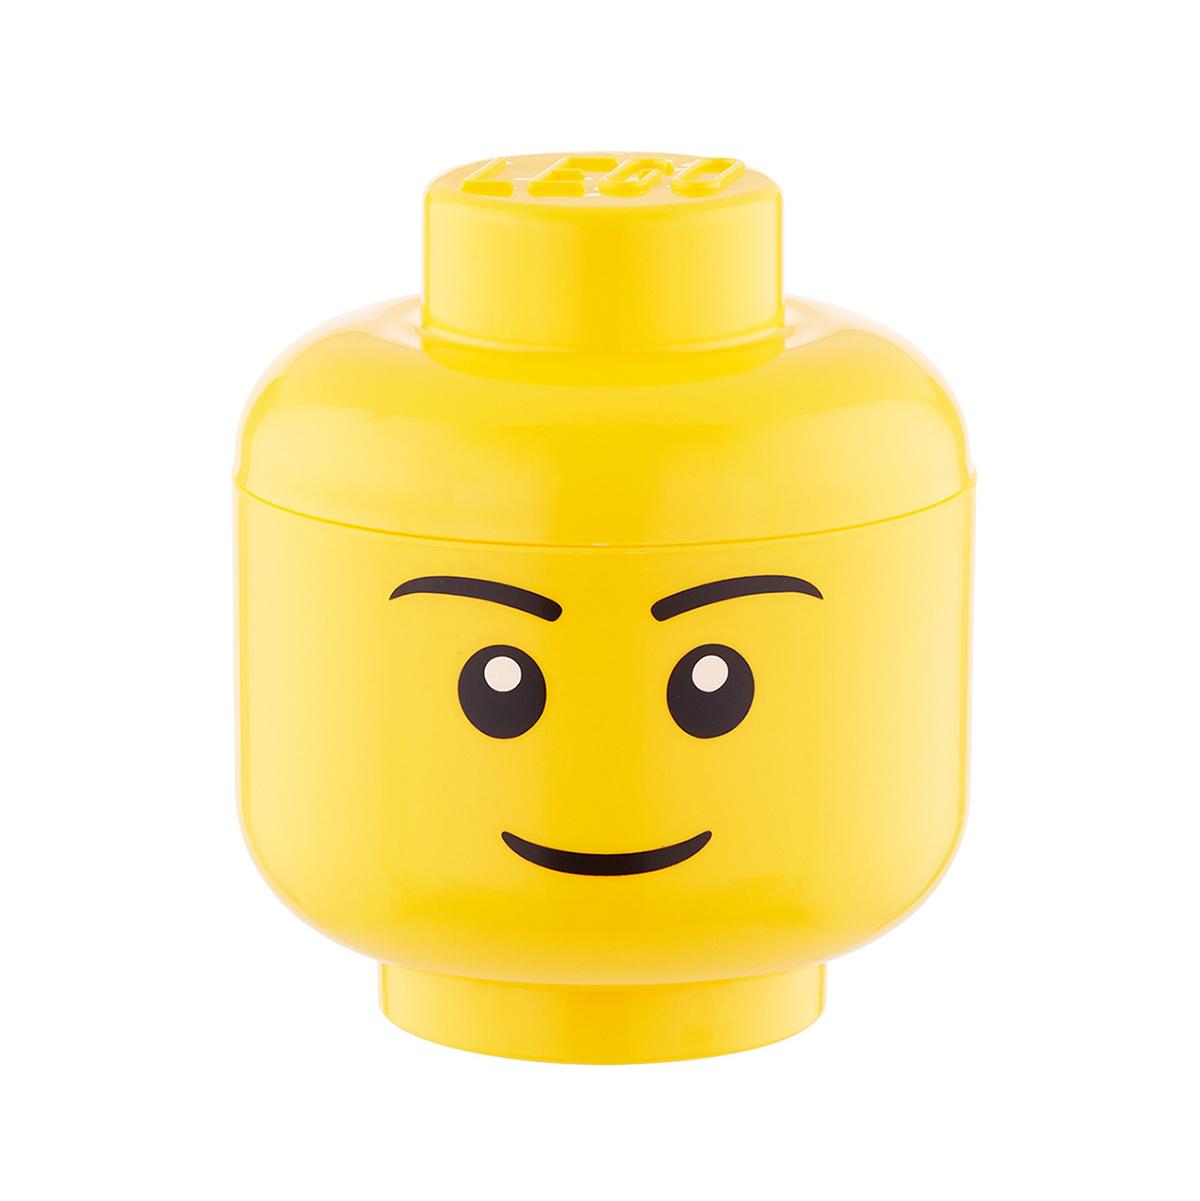 Lego~ Storage Head